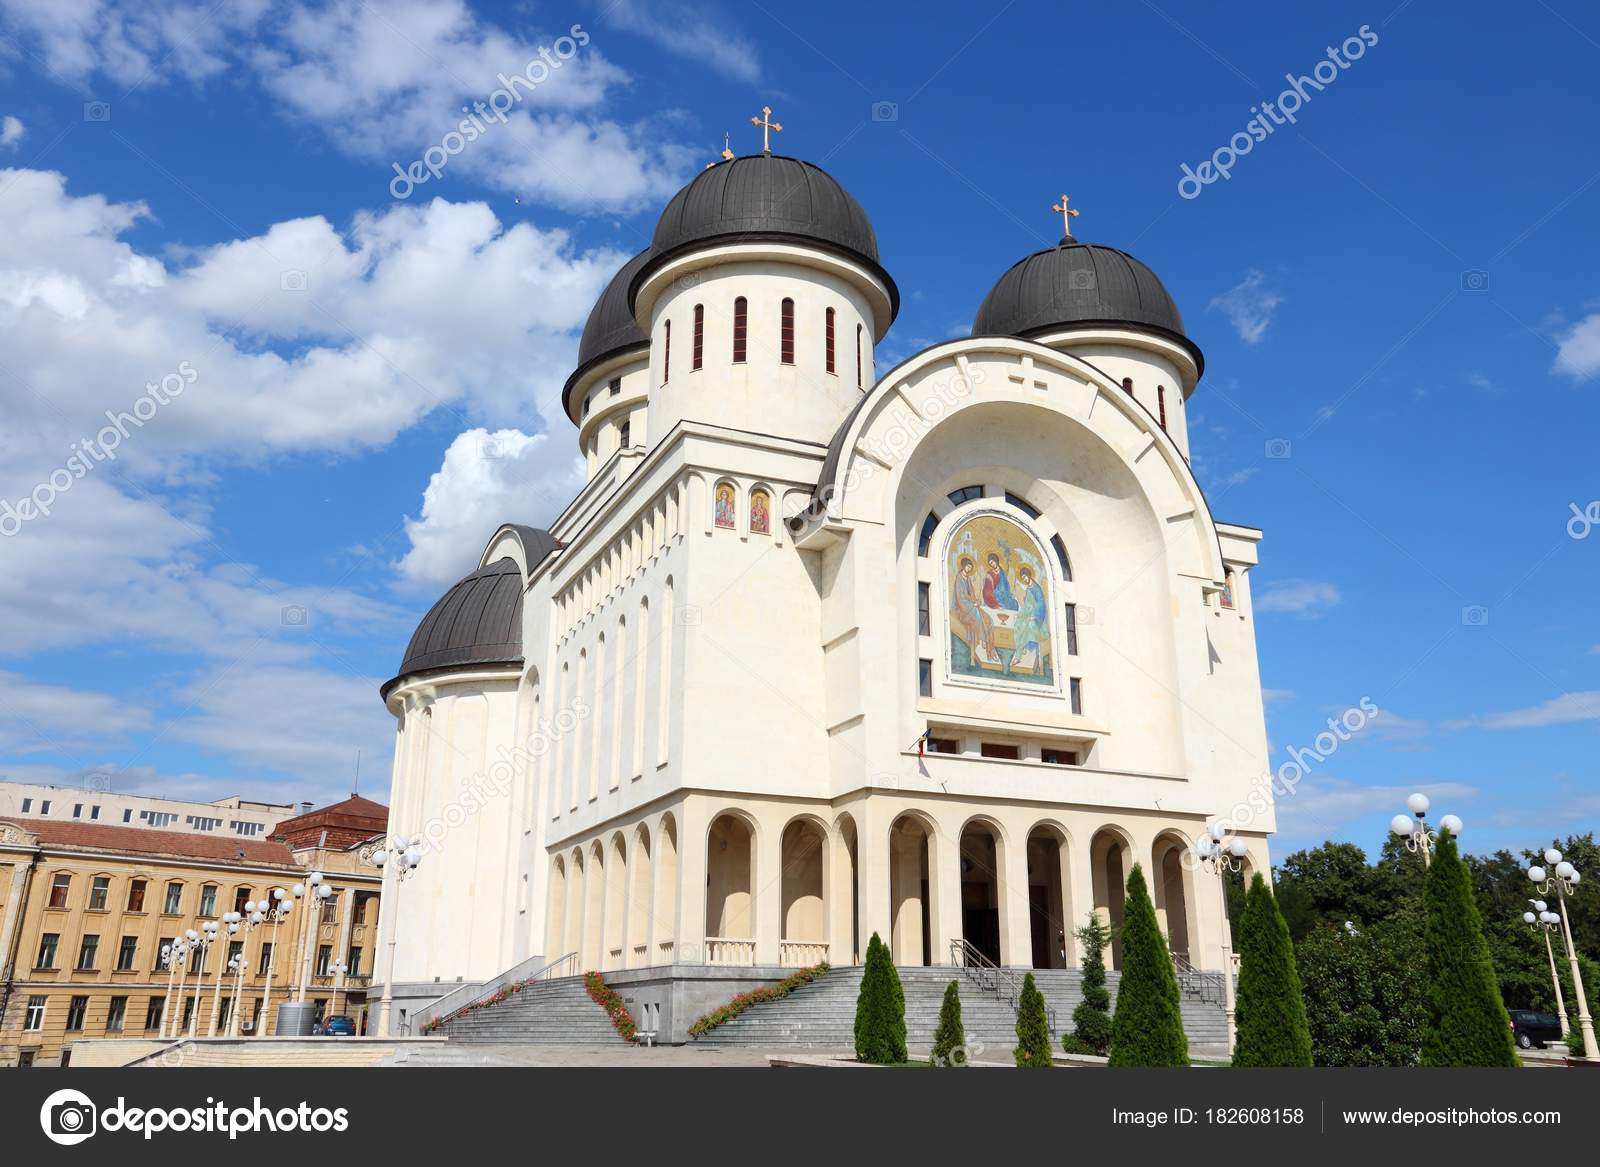 Arad Rumänien arad rumänien stadtarchitektur stockfoto tupungato 182608158